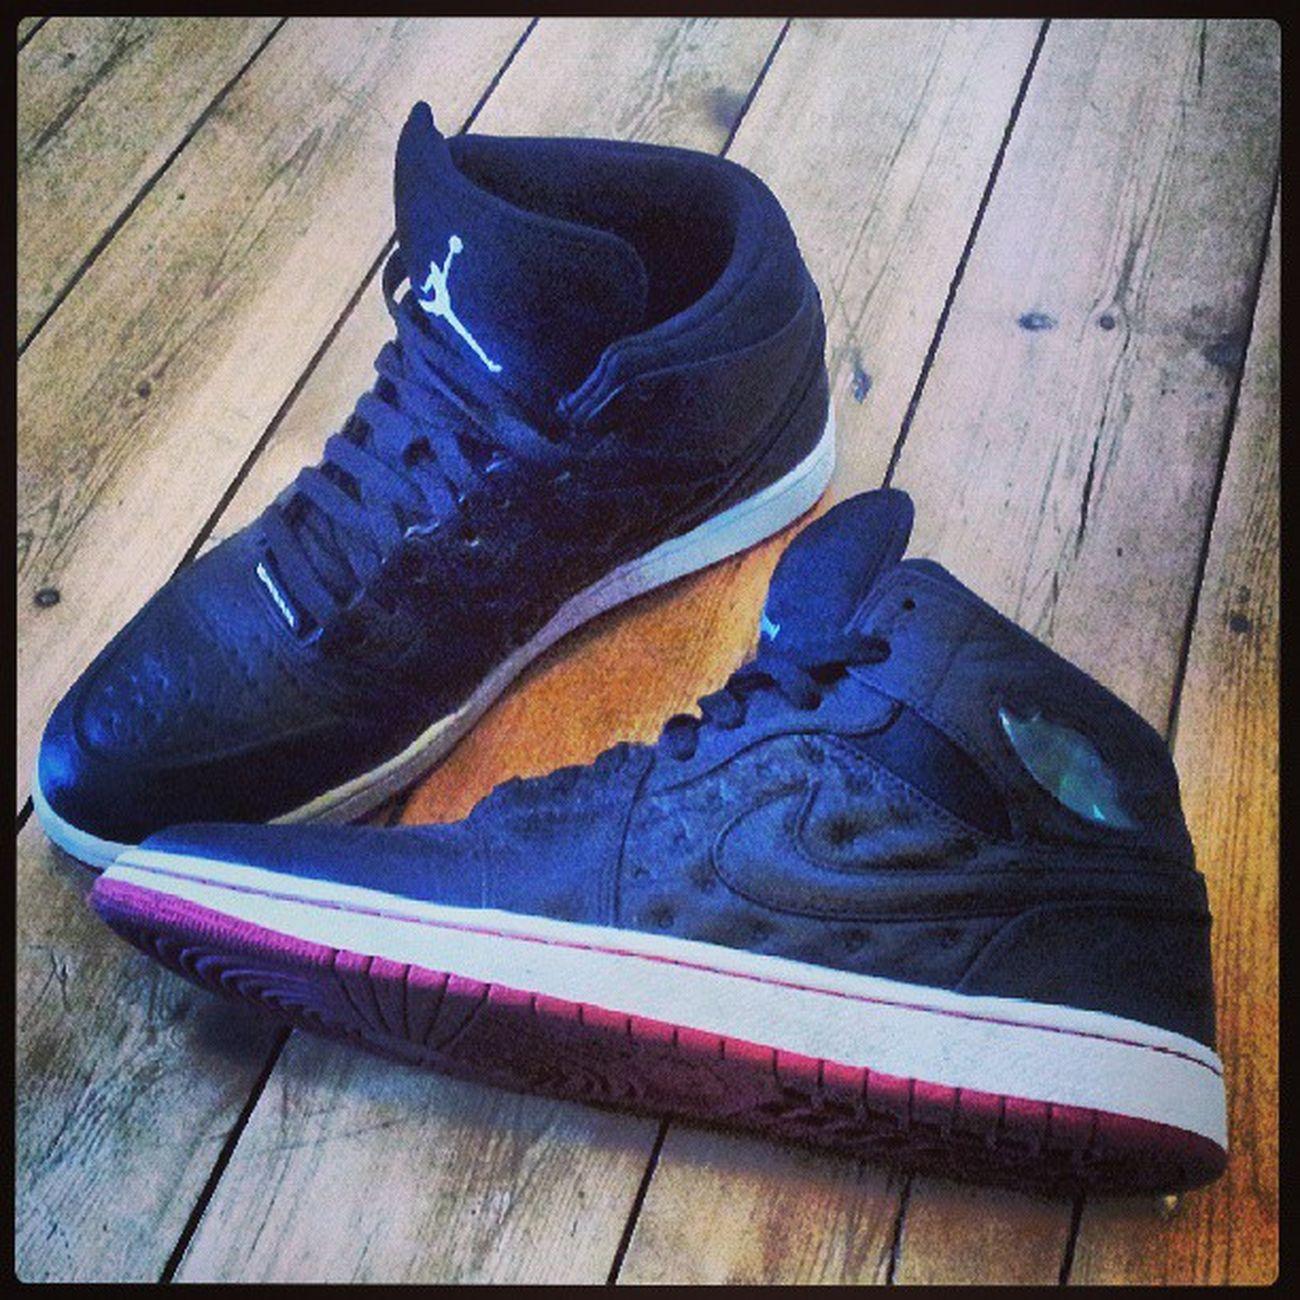 I love them @daily_jordans Newjordans 97 Shoes Proudlikeoscar